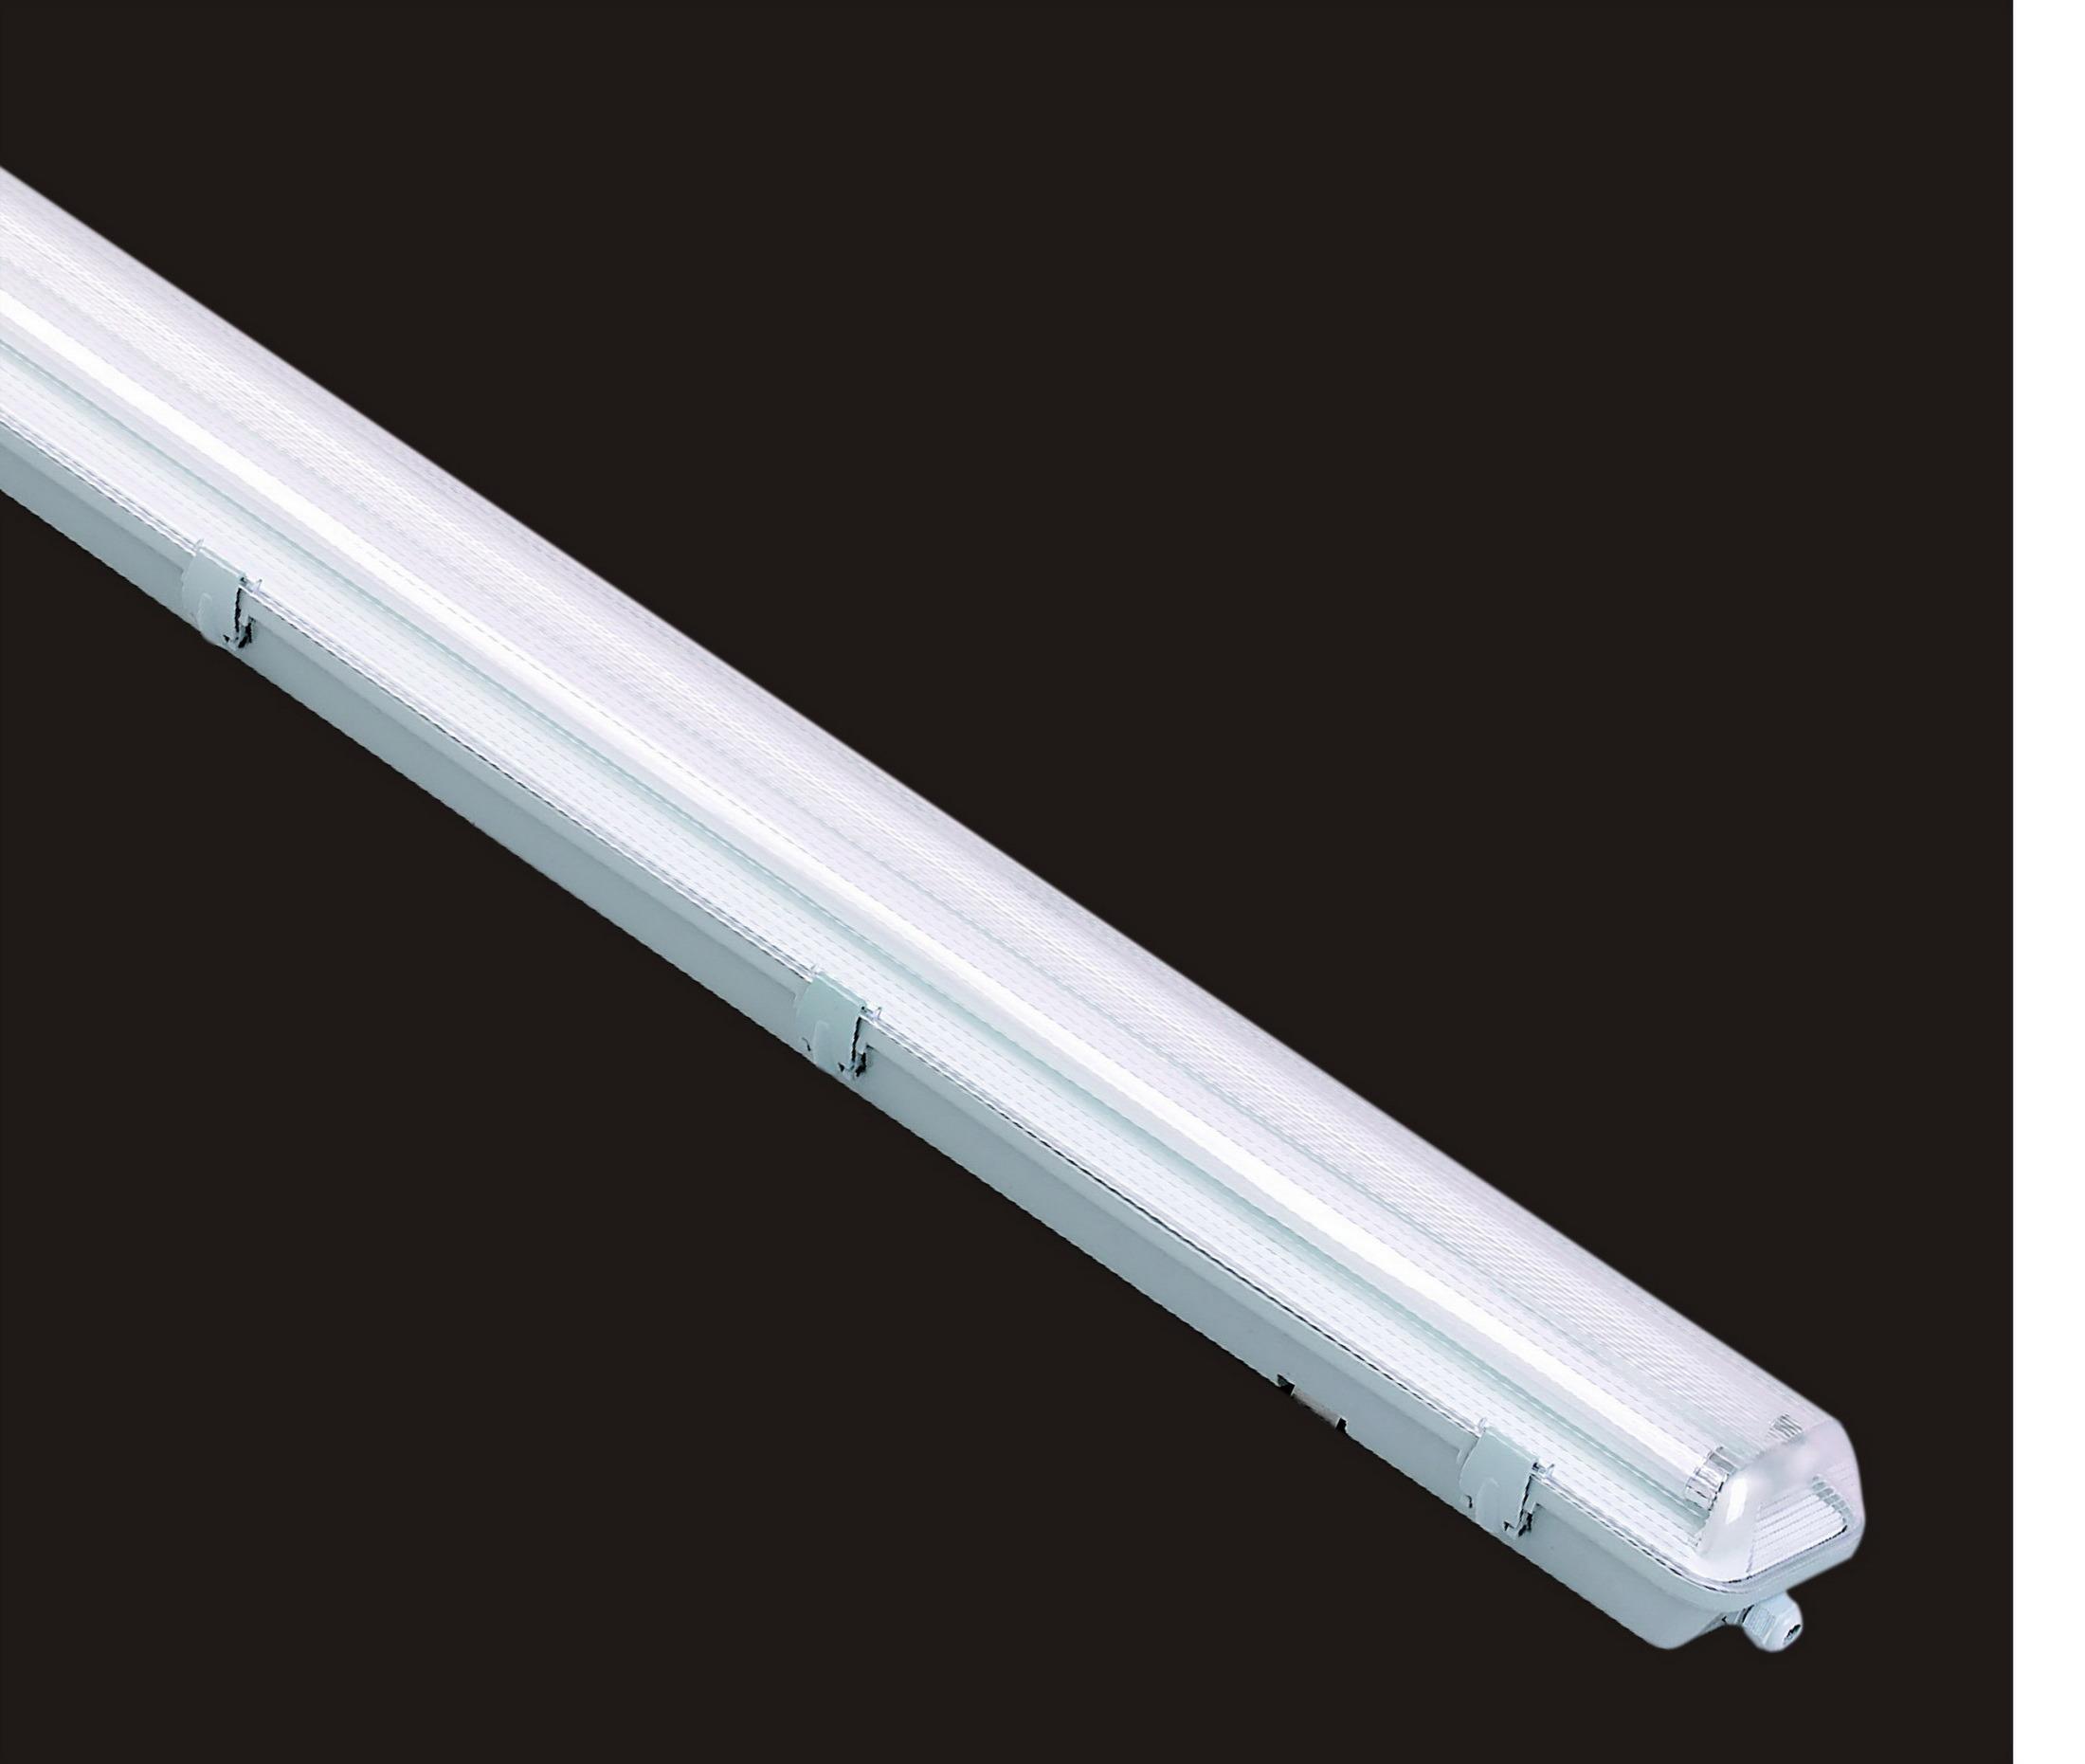 Waterproof Light Fitting (FT-G)